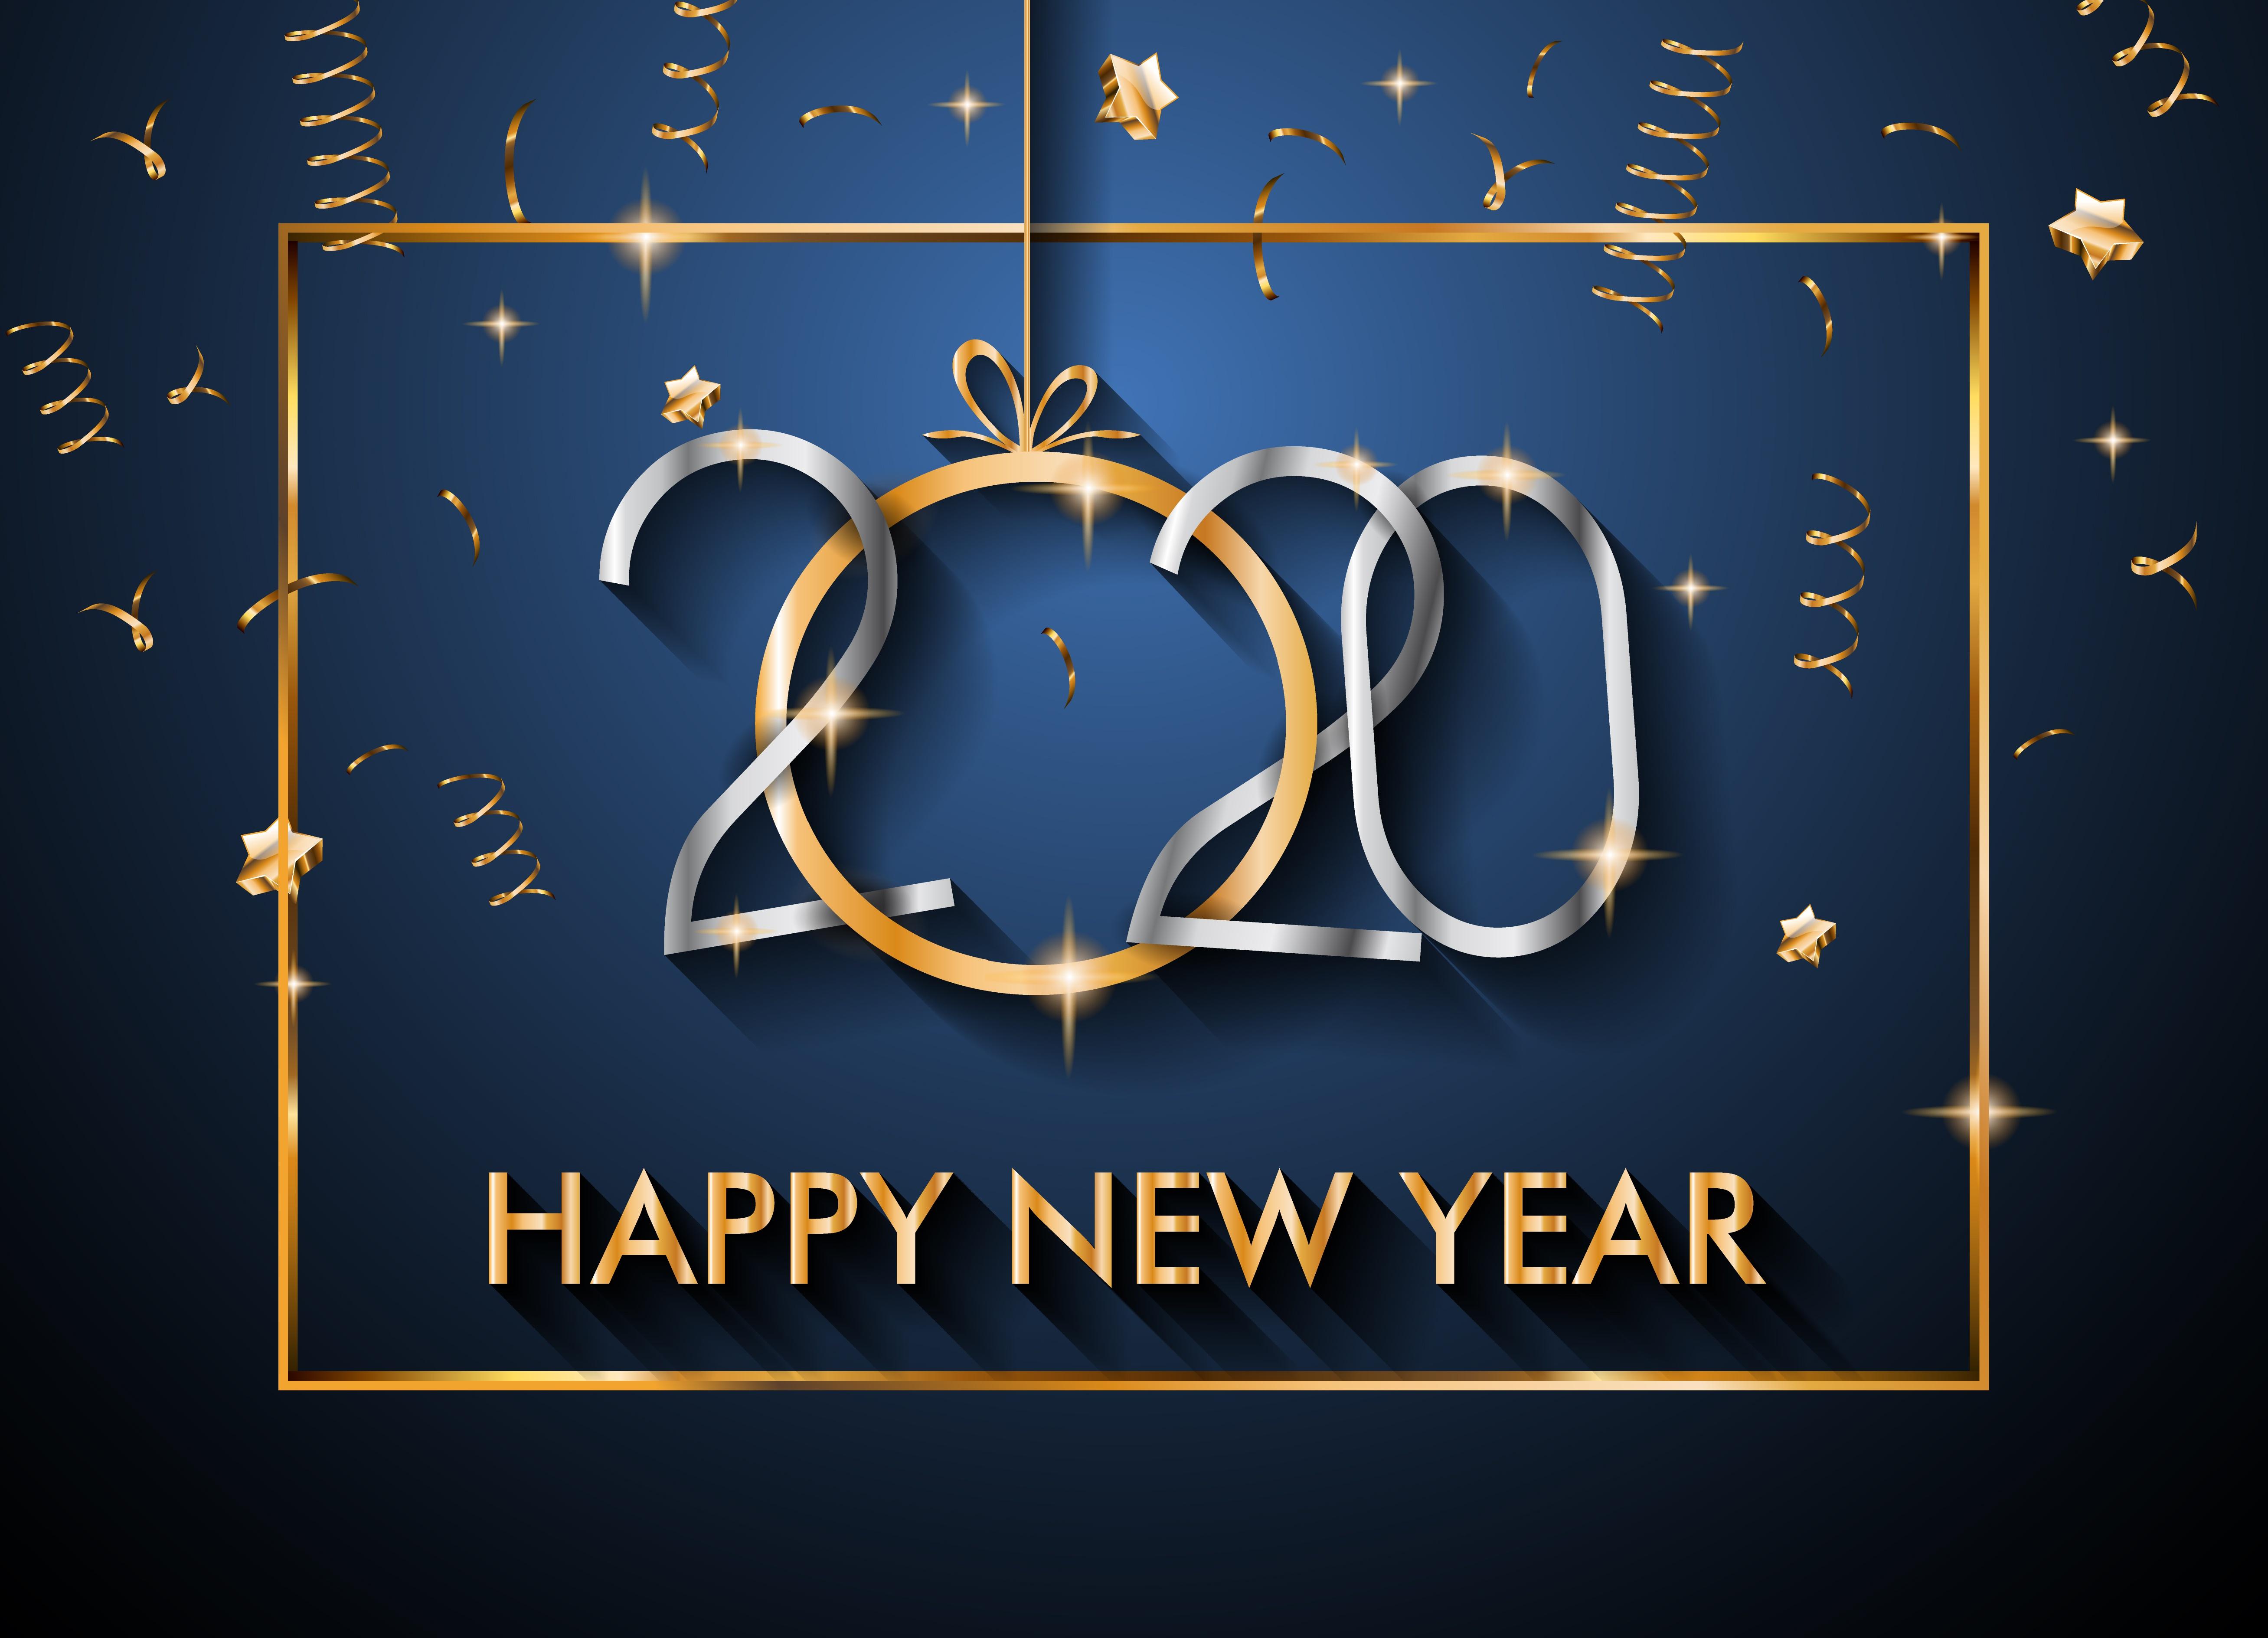 New Year 2020 5k Retina Ultra HD Wallpaper Background Image 5230x3777